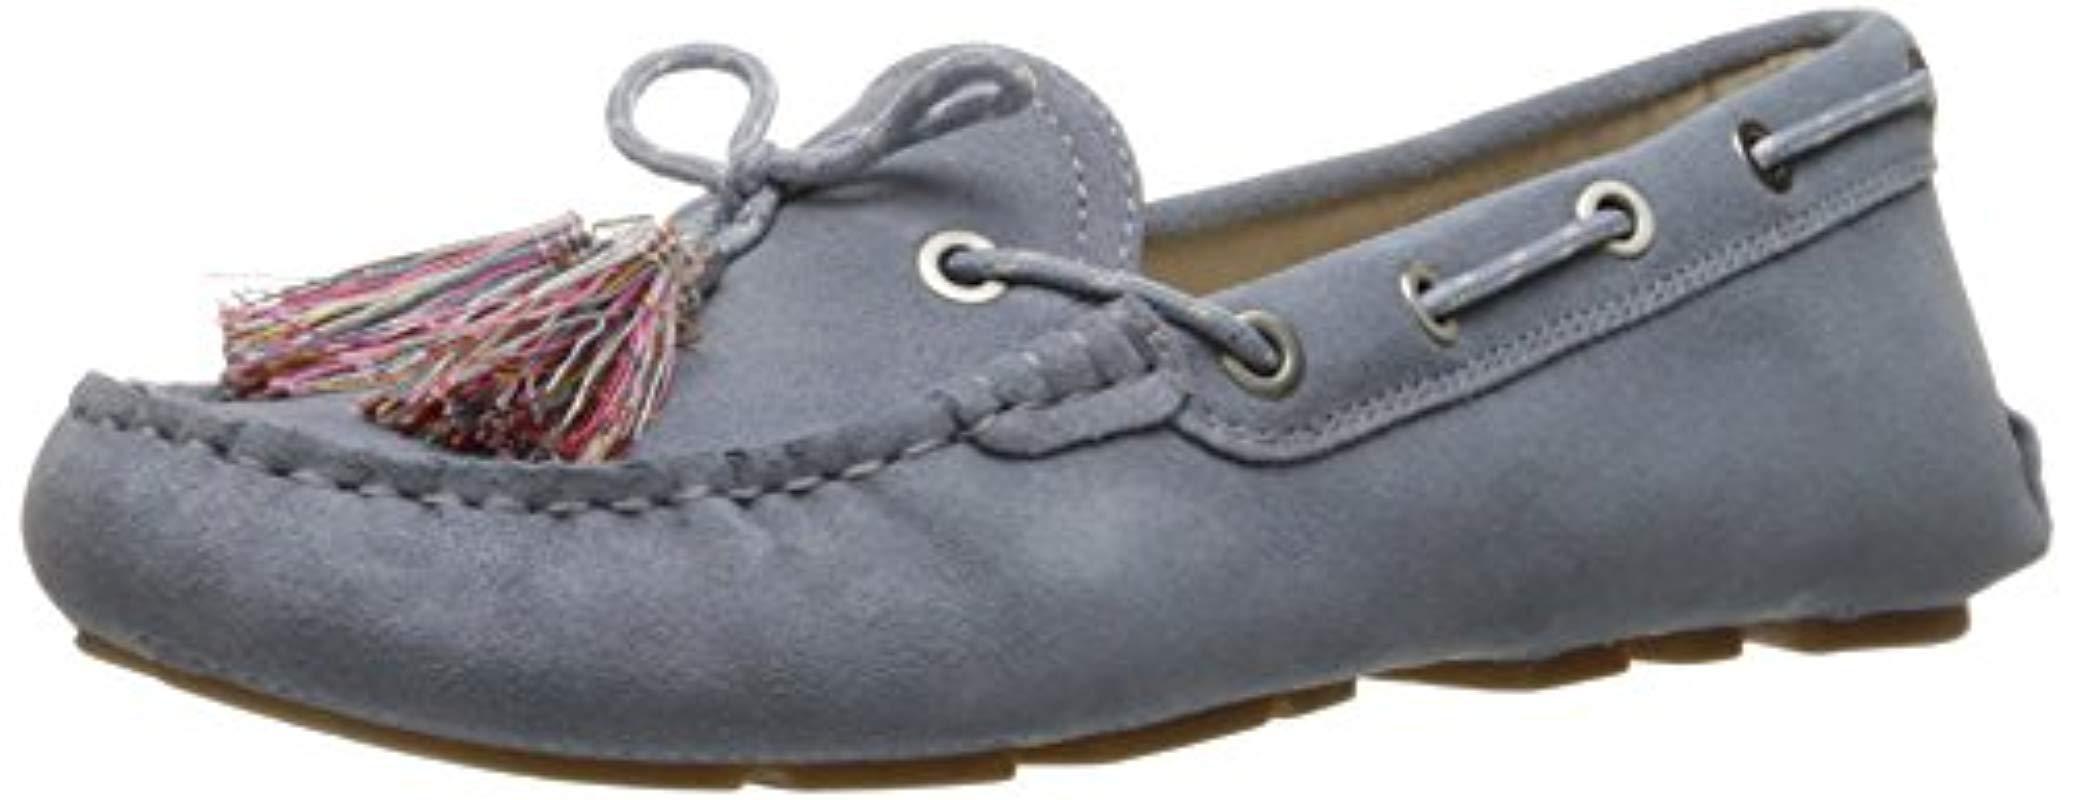 fcc674d4f Lyst - Sam Edelman Fantine Boat Shoe in Blue - Save 38.0%